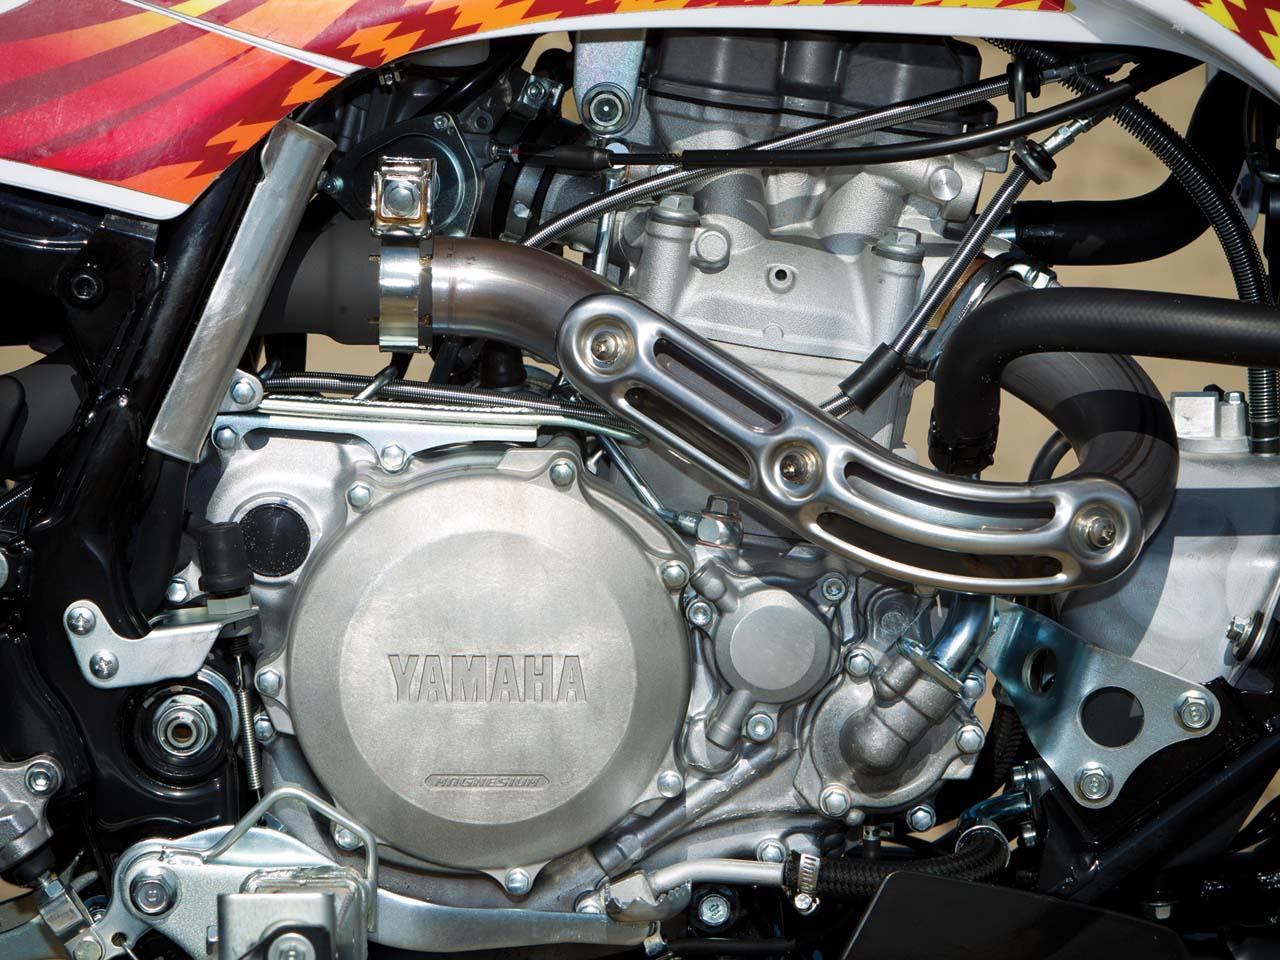 hight resolution of engine cooling design volkswagen engine design hyundai 2 7l engine design audi engine design yamaha engine